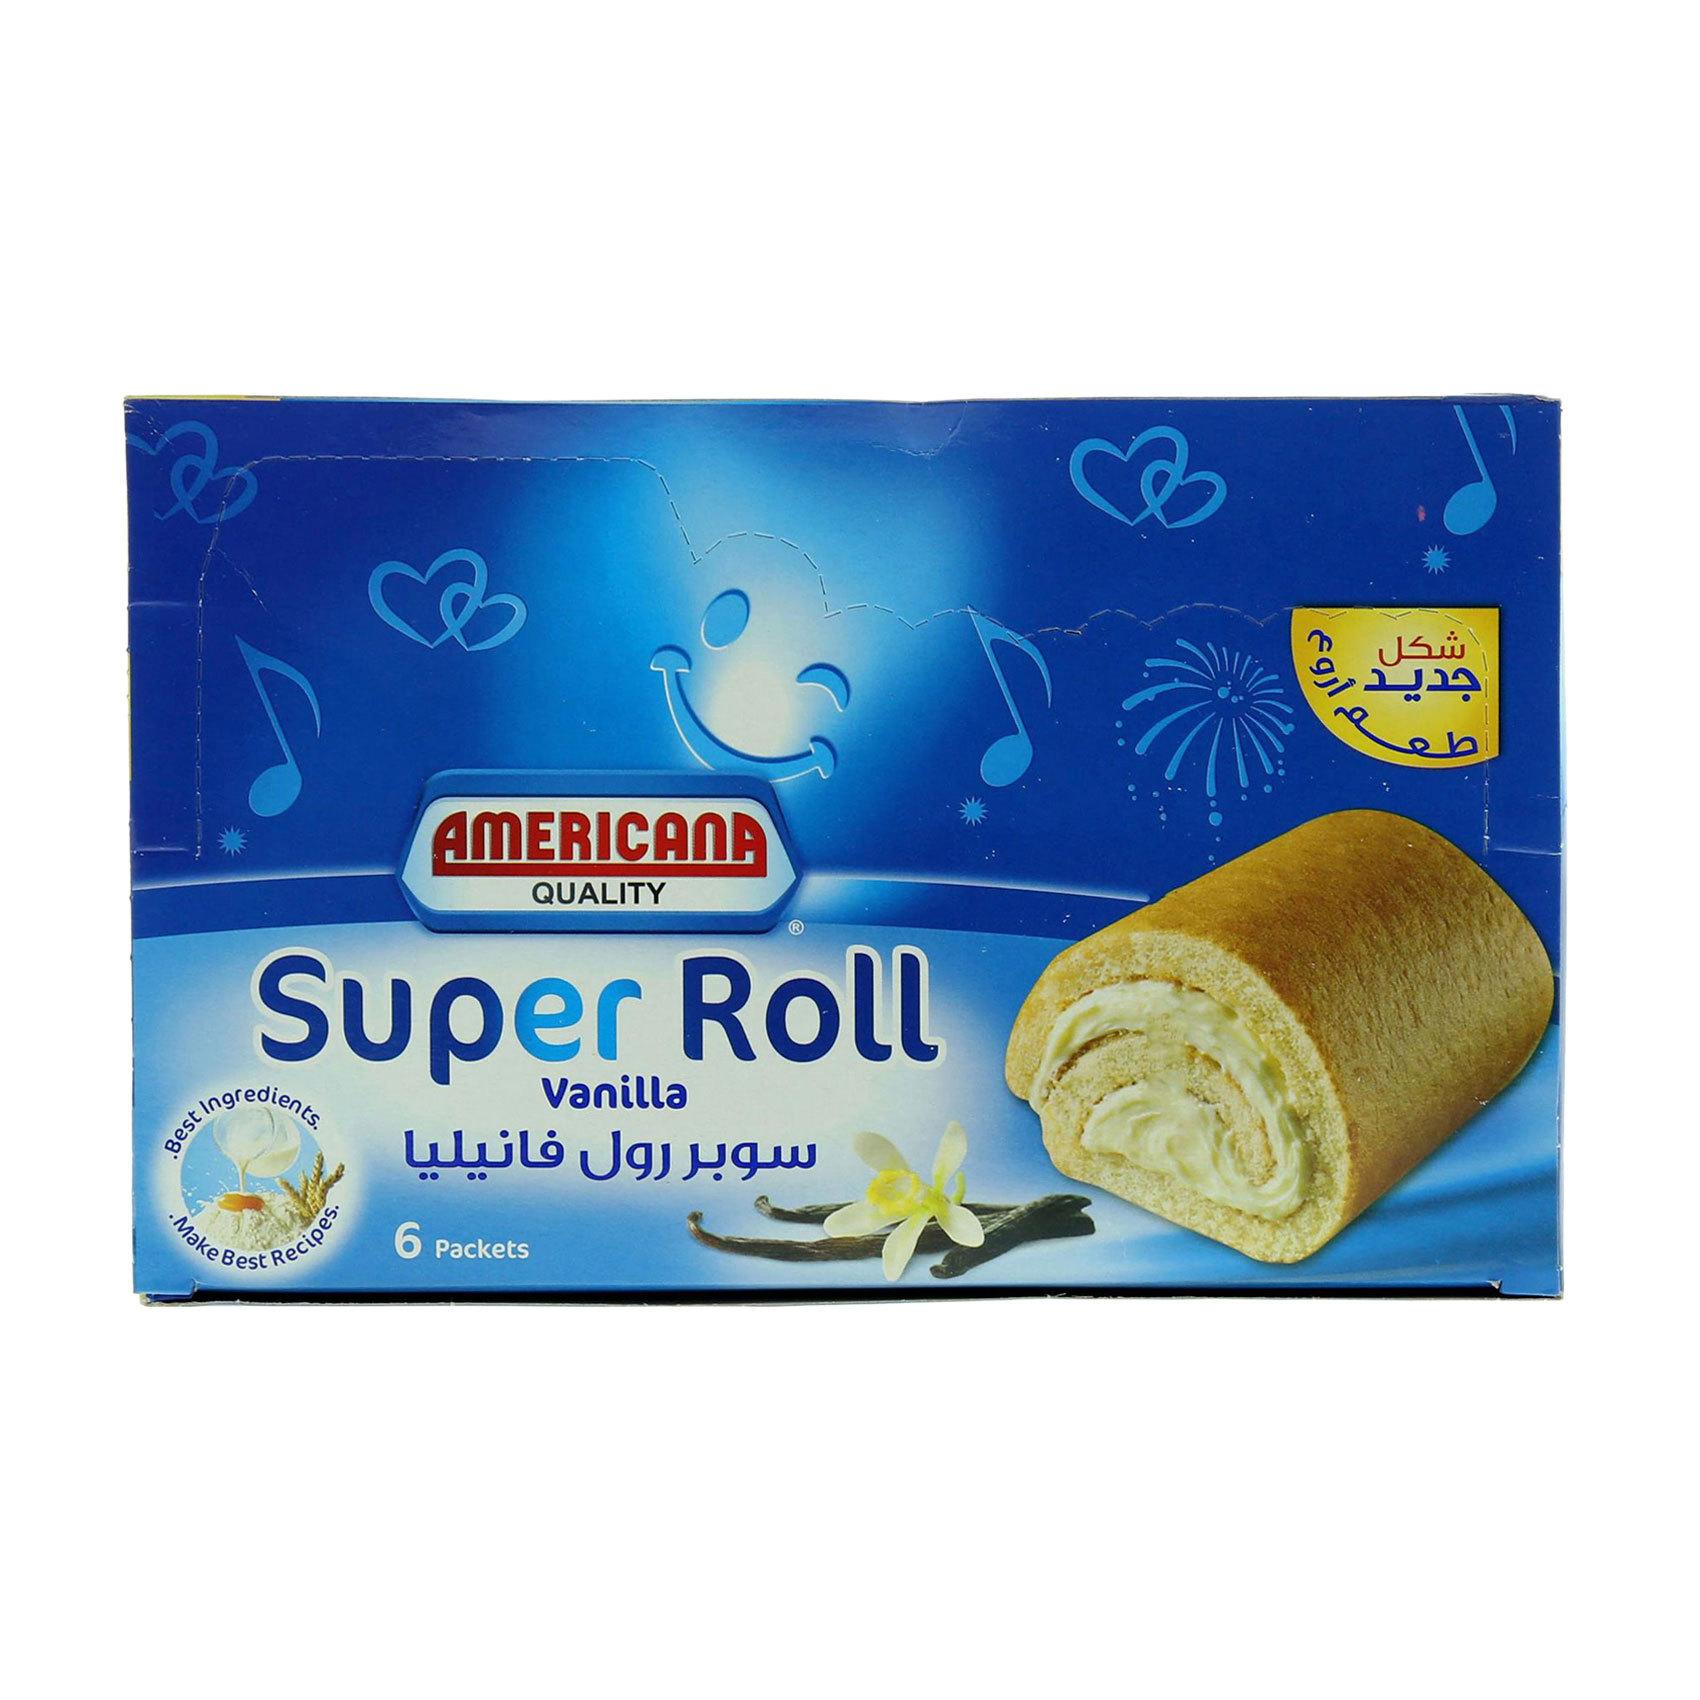 AMERICANA SUPER ROLL VANILLA 60GX6